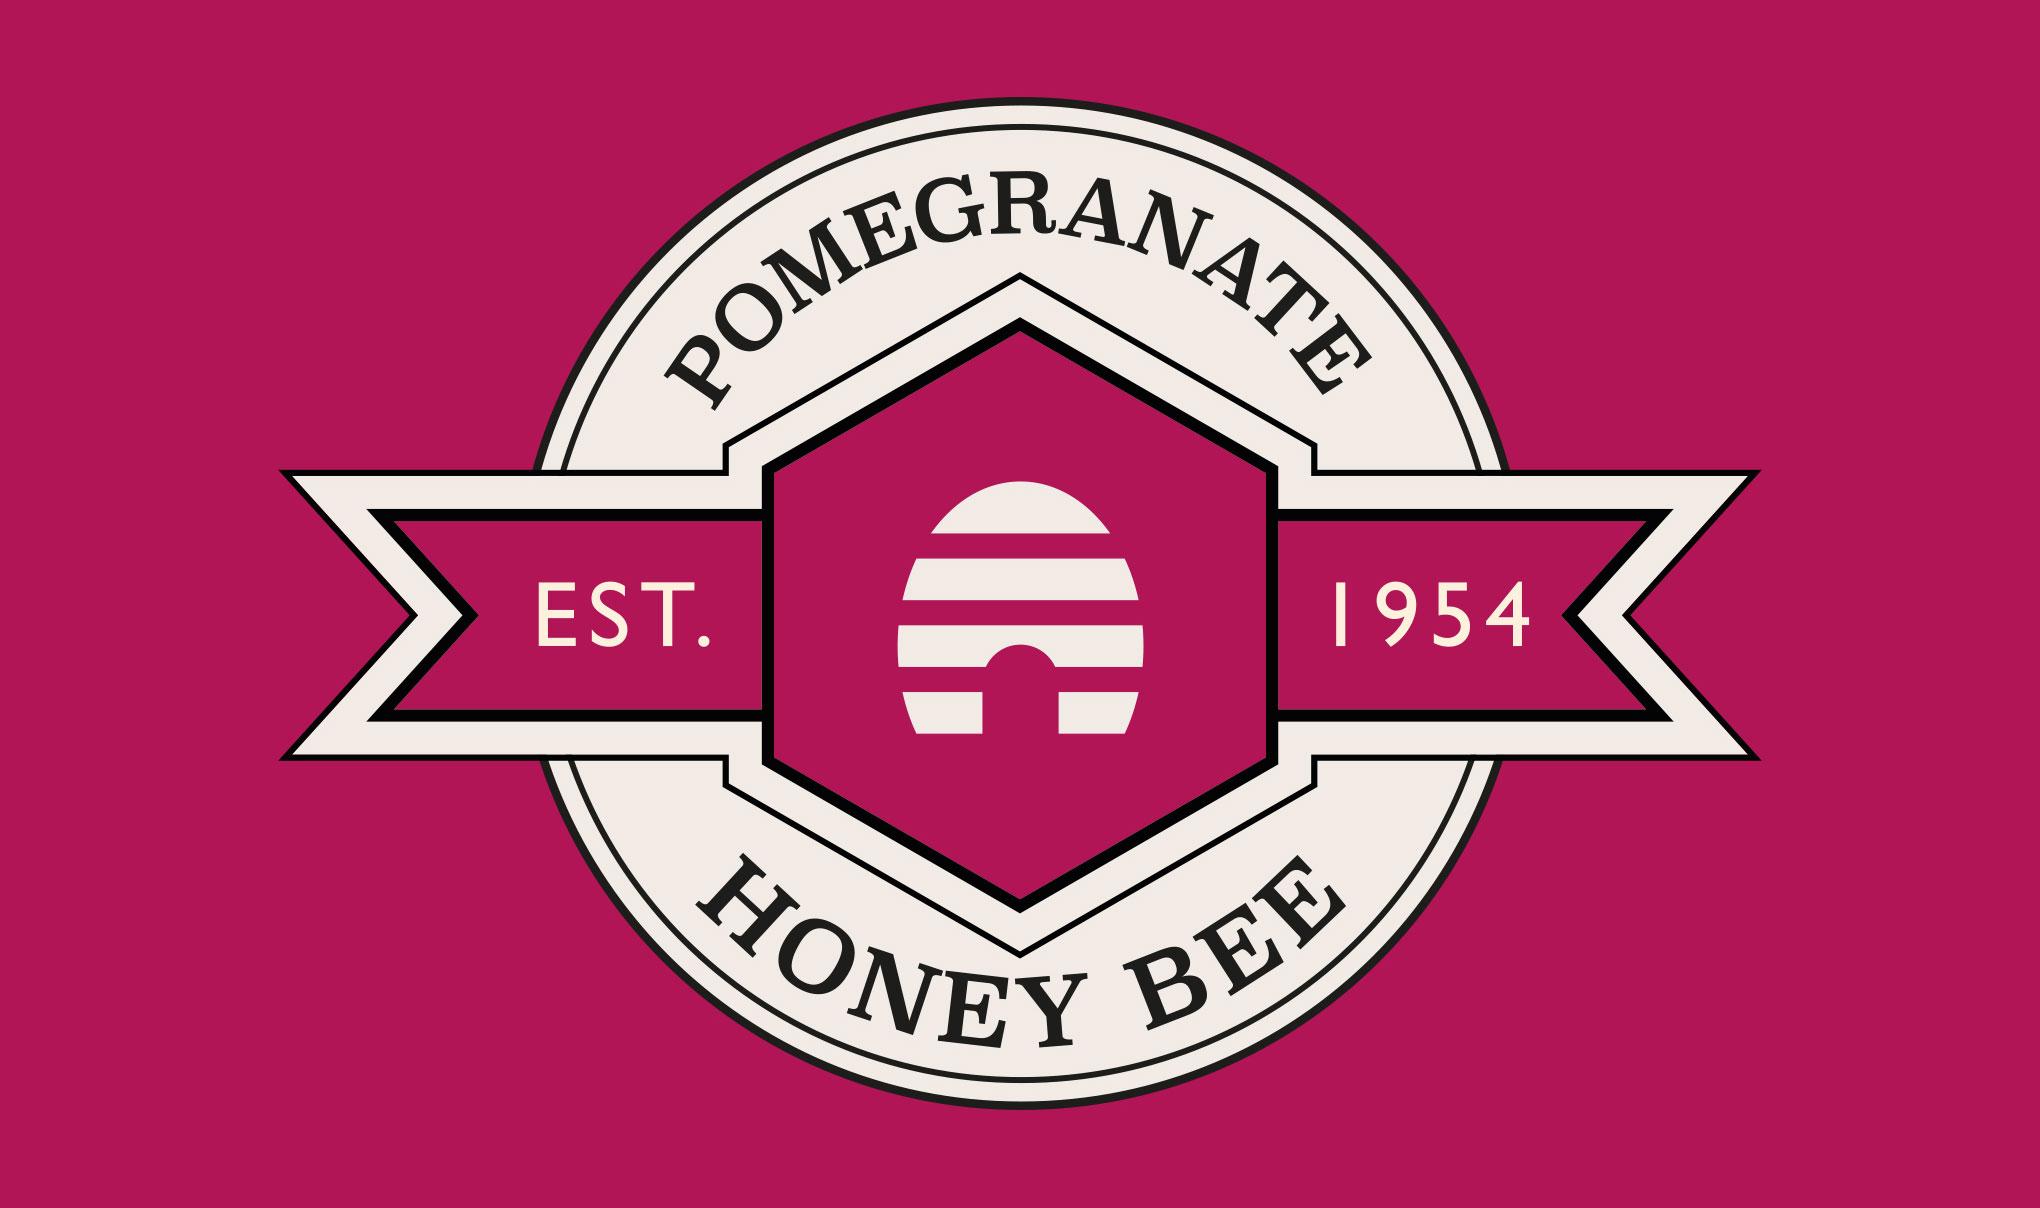 Brand logo for 'Honey Bee' on on pomegranate background colour. Designed for Amber House by packaging design agency - Flipflop Design Ltd.